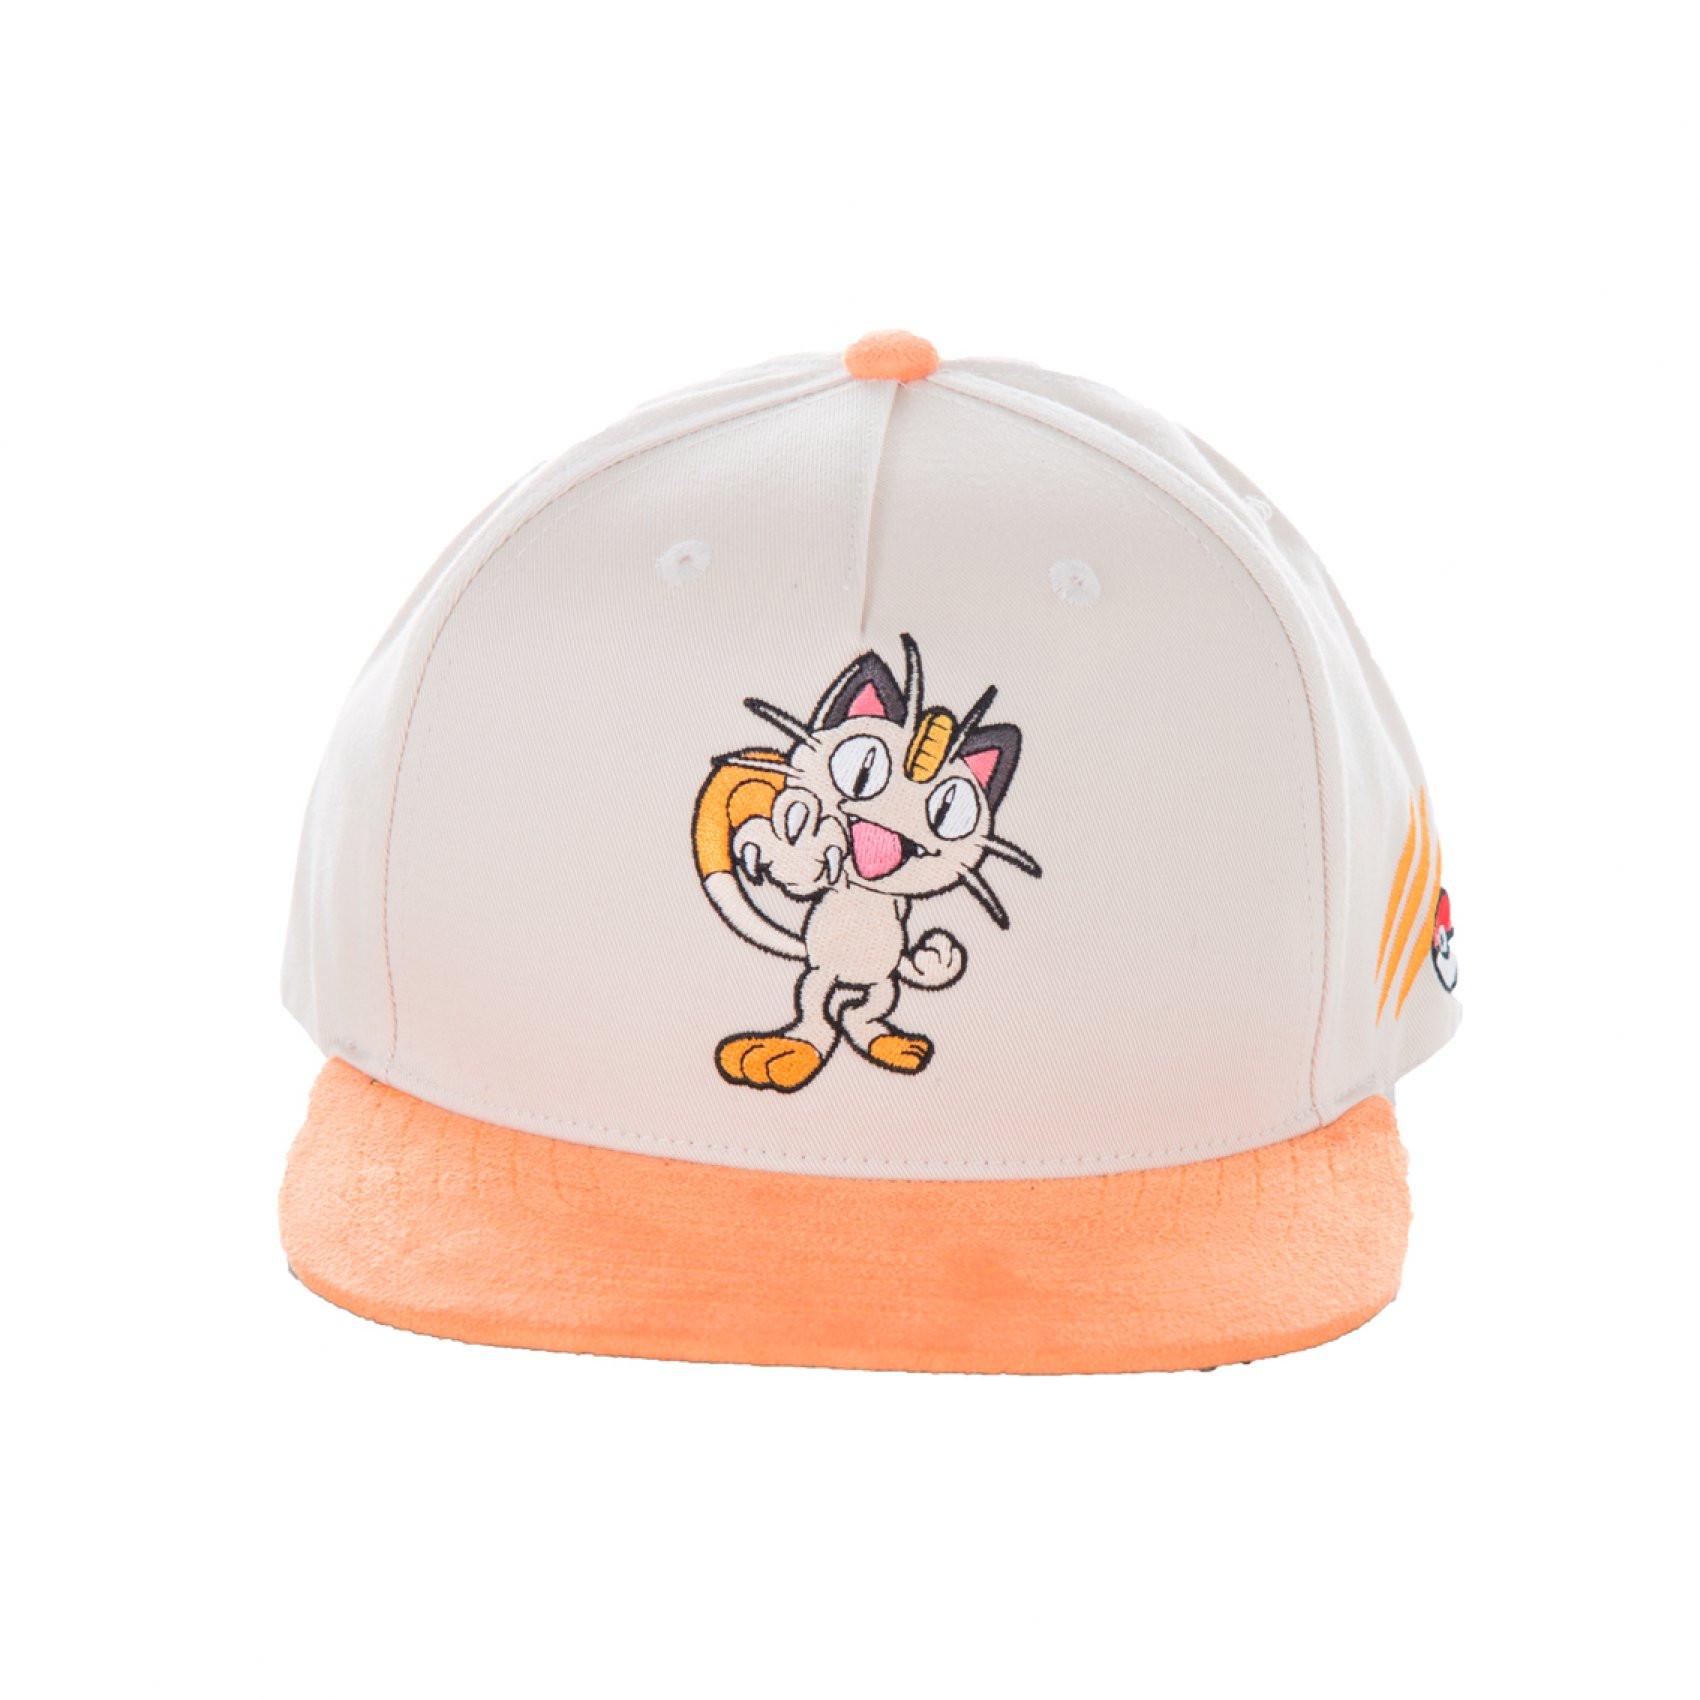 Casquette baseball enfant pokemon miaouss freegun (photo)